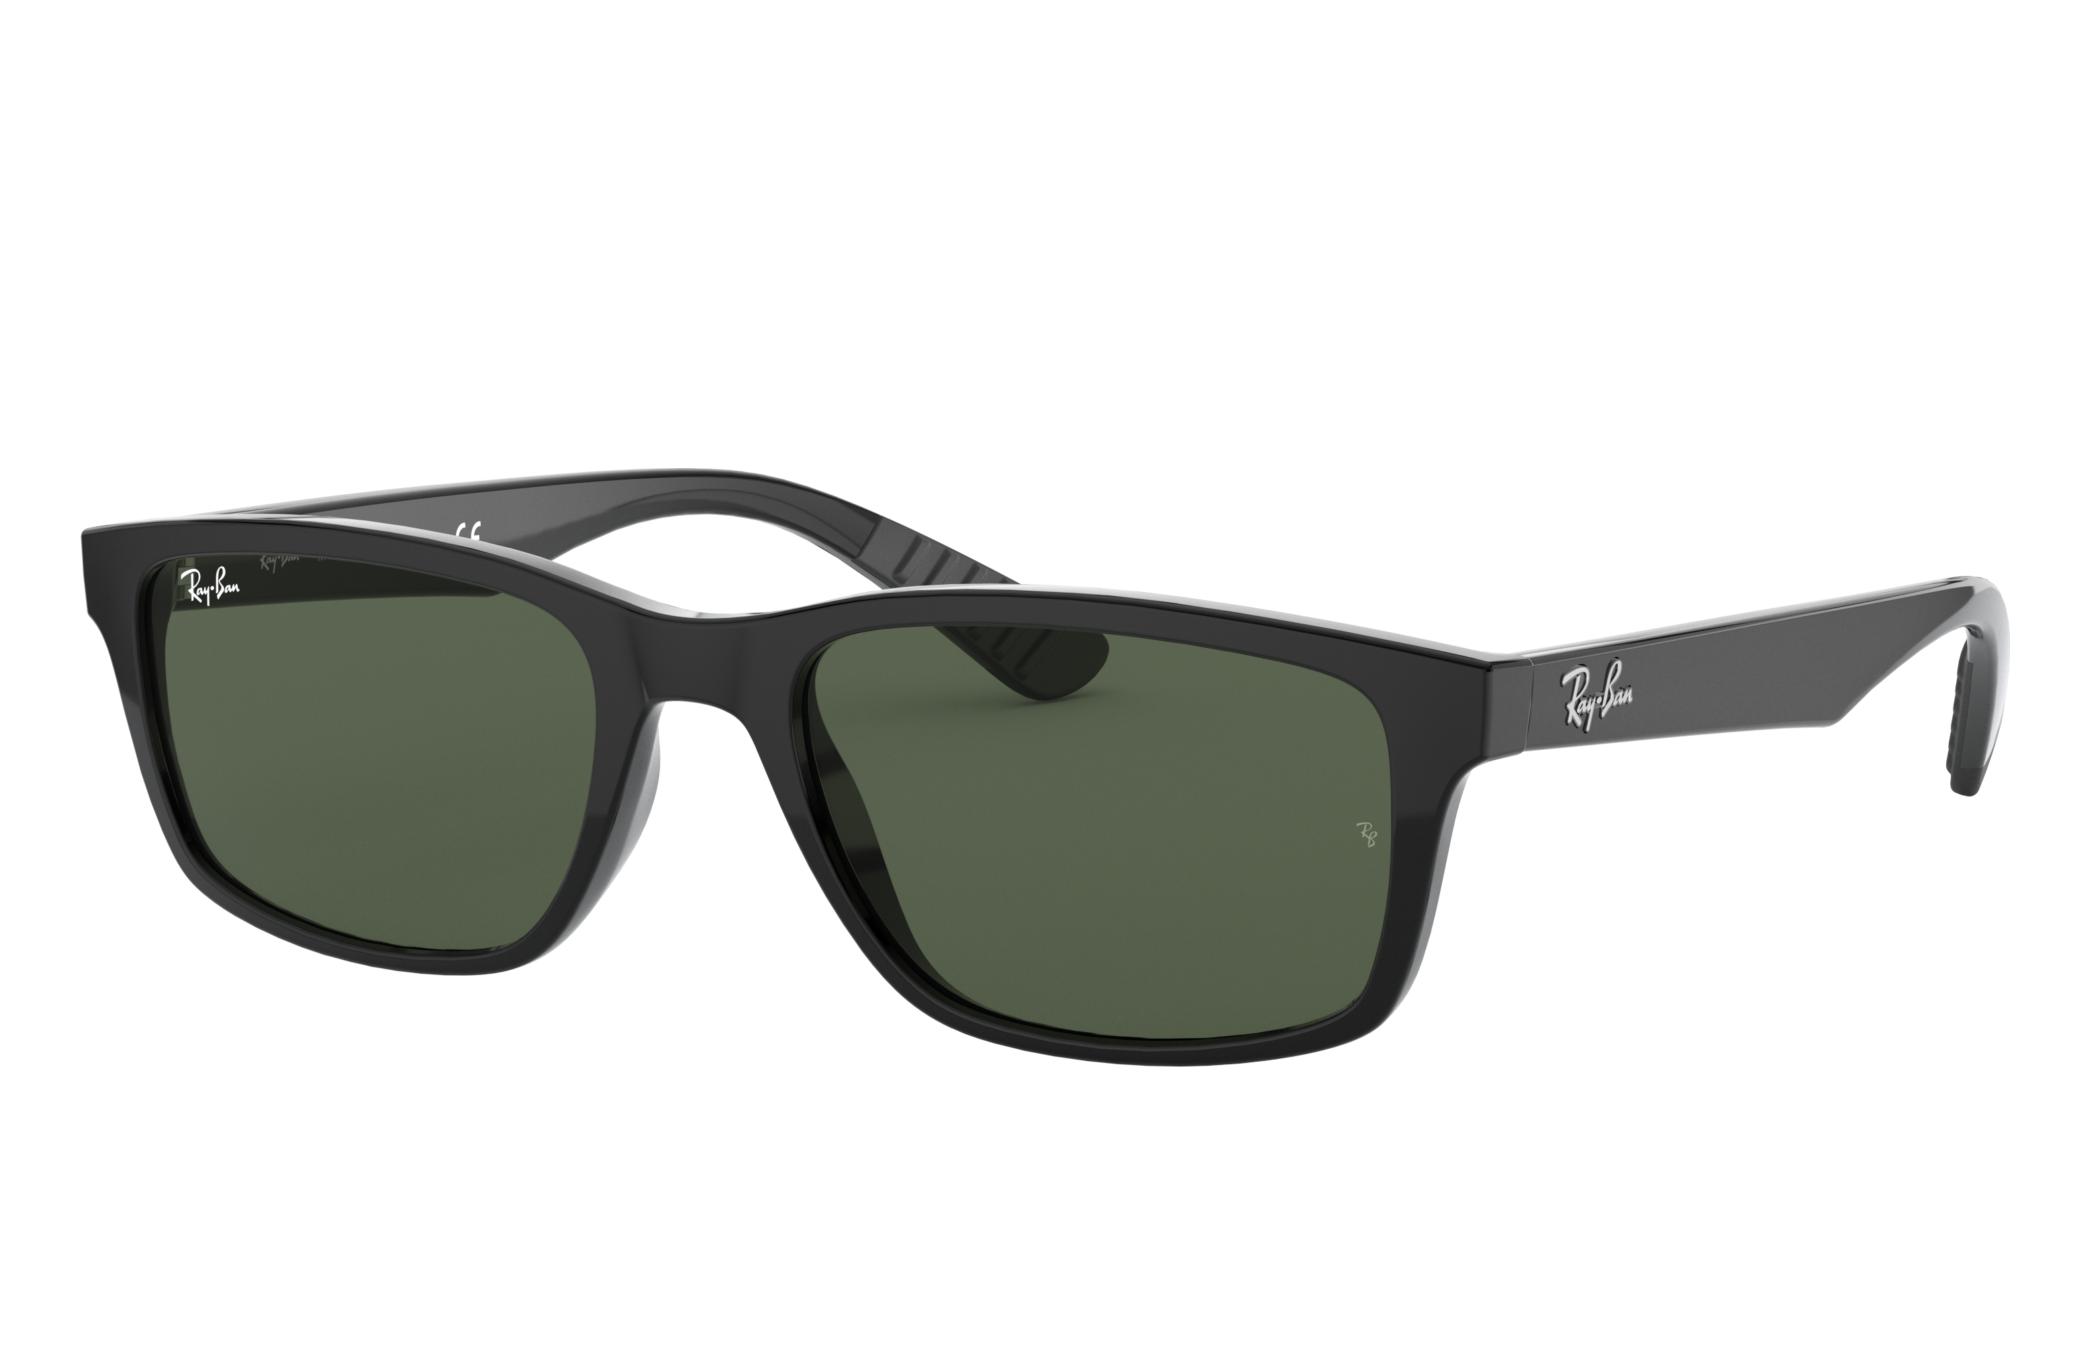 Ray-Ban Rb4234 Black, Green Lenses - RB4234